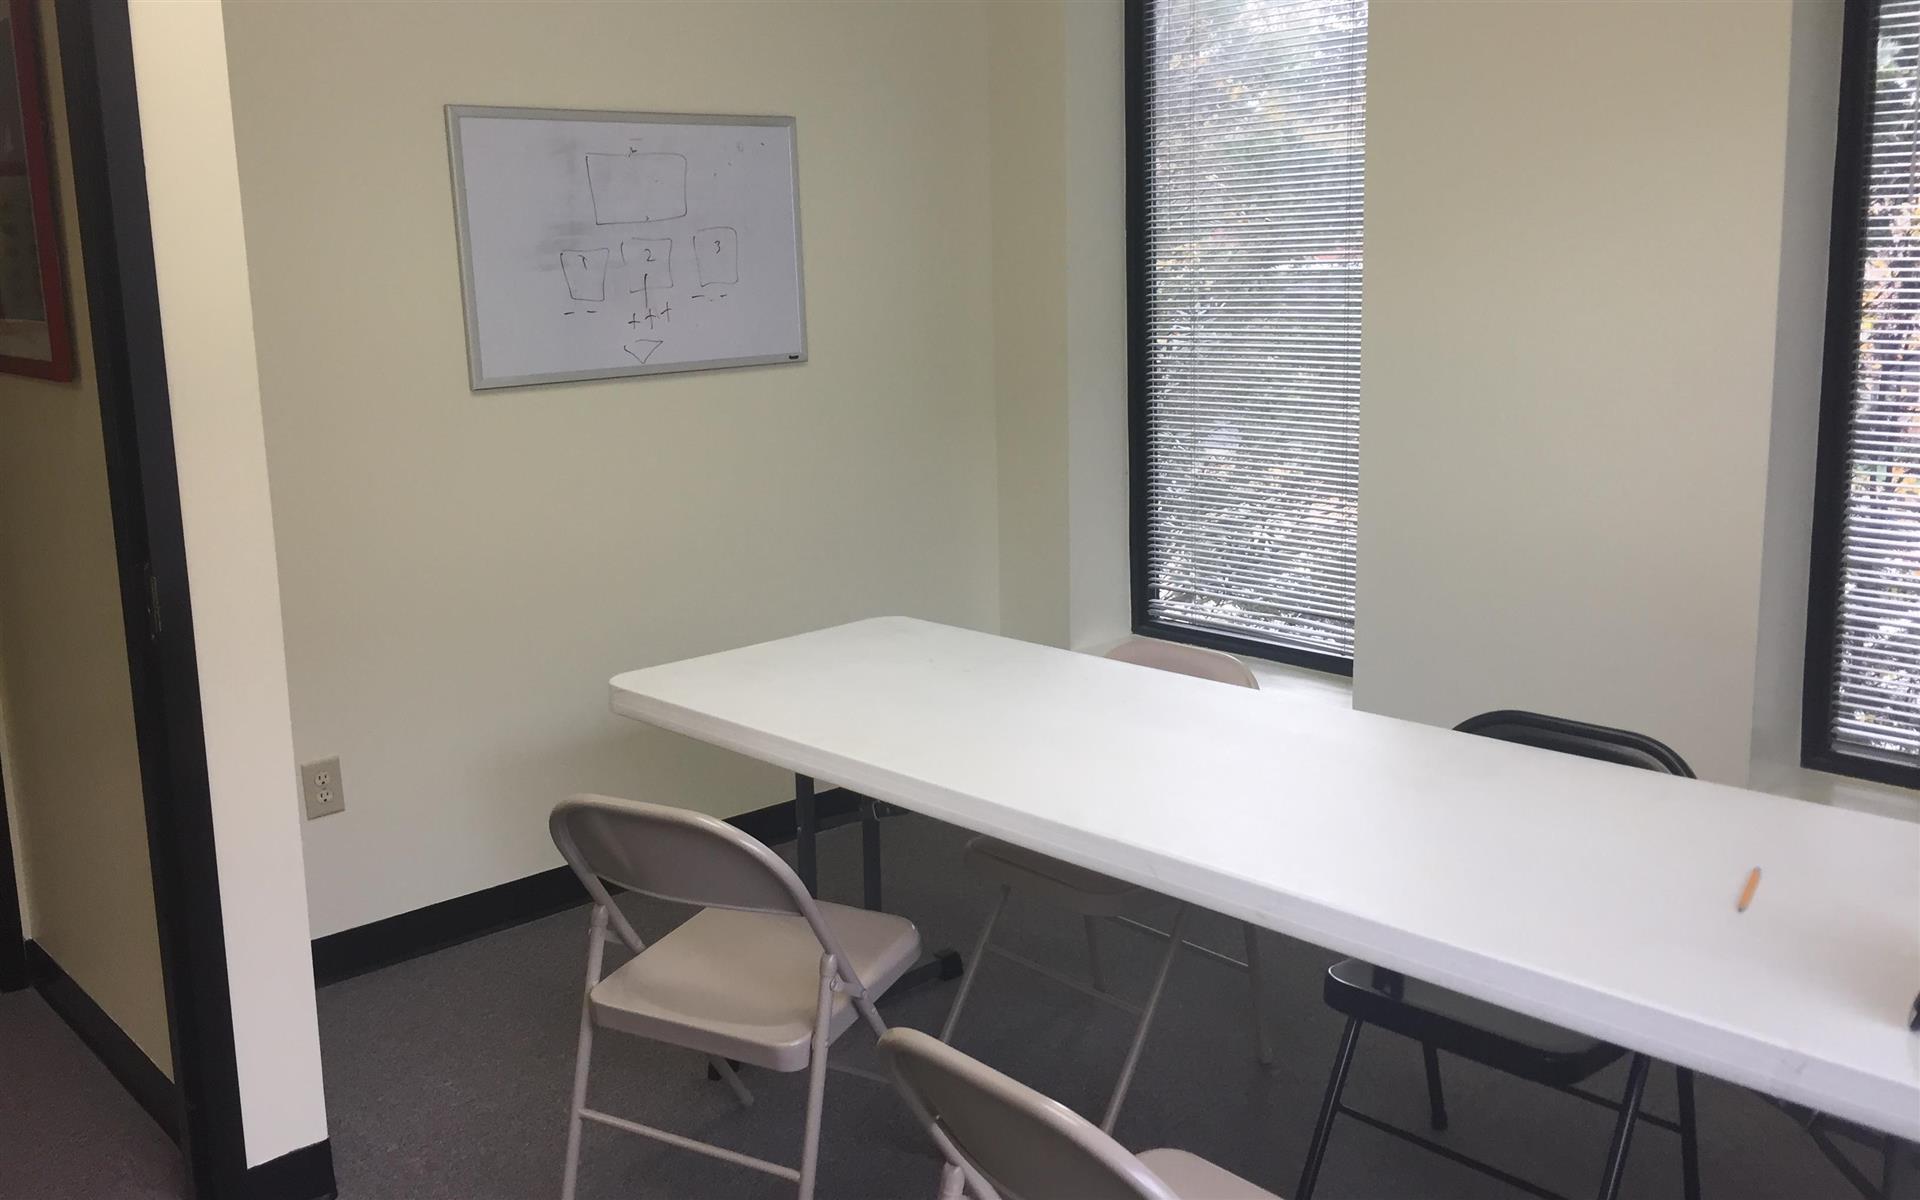 Mindspire Tutoring and Test Prep - Office 2